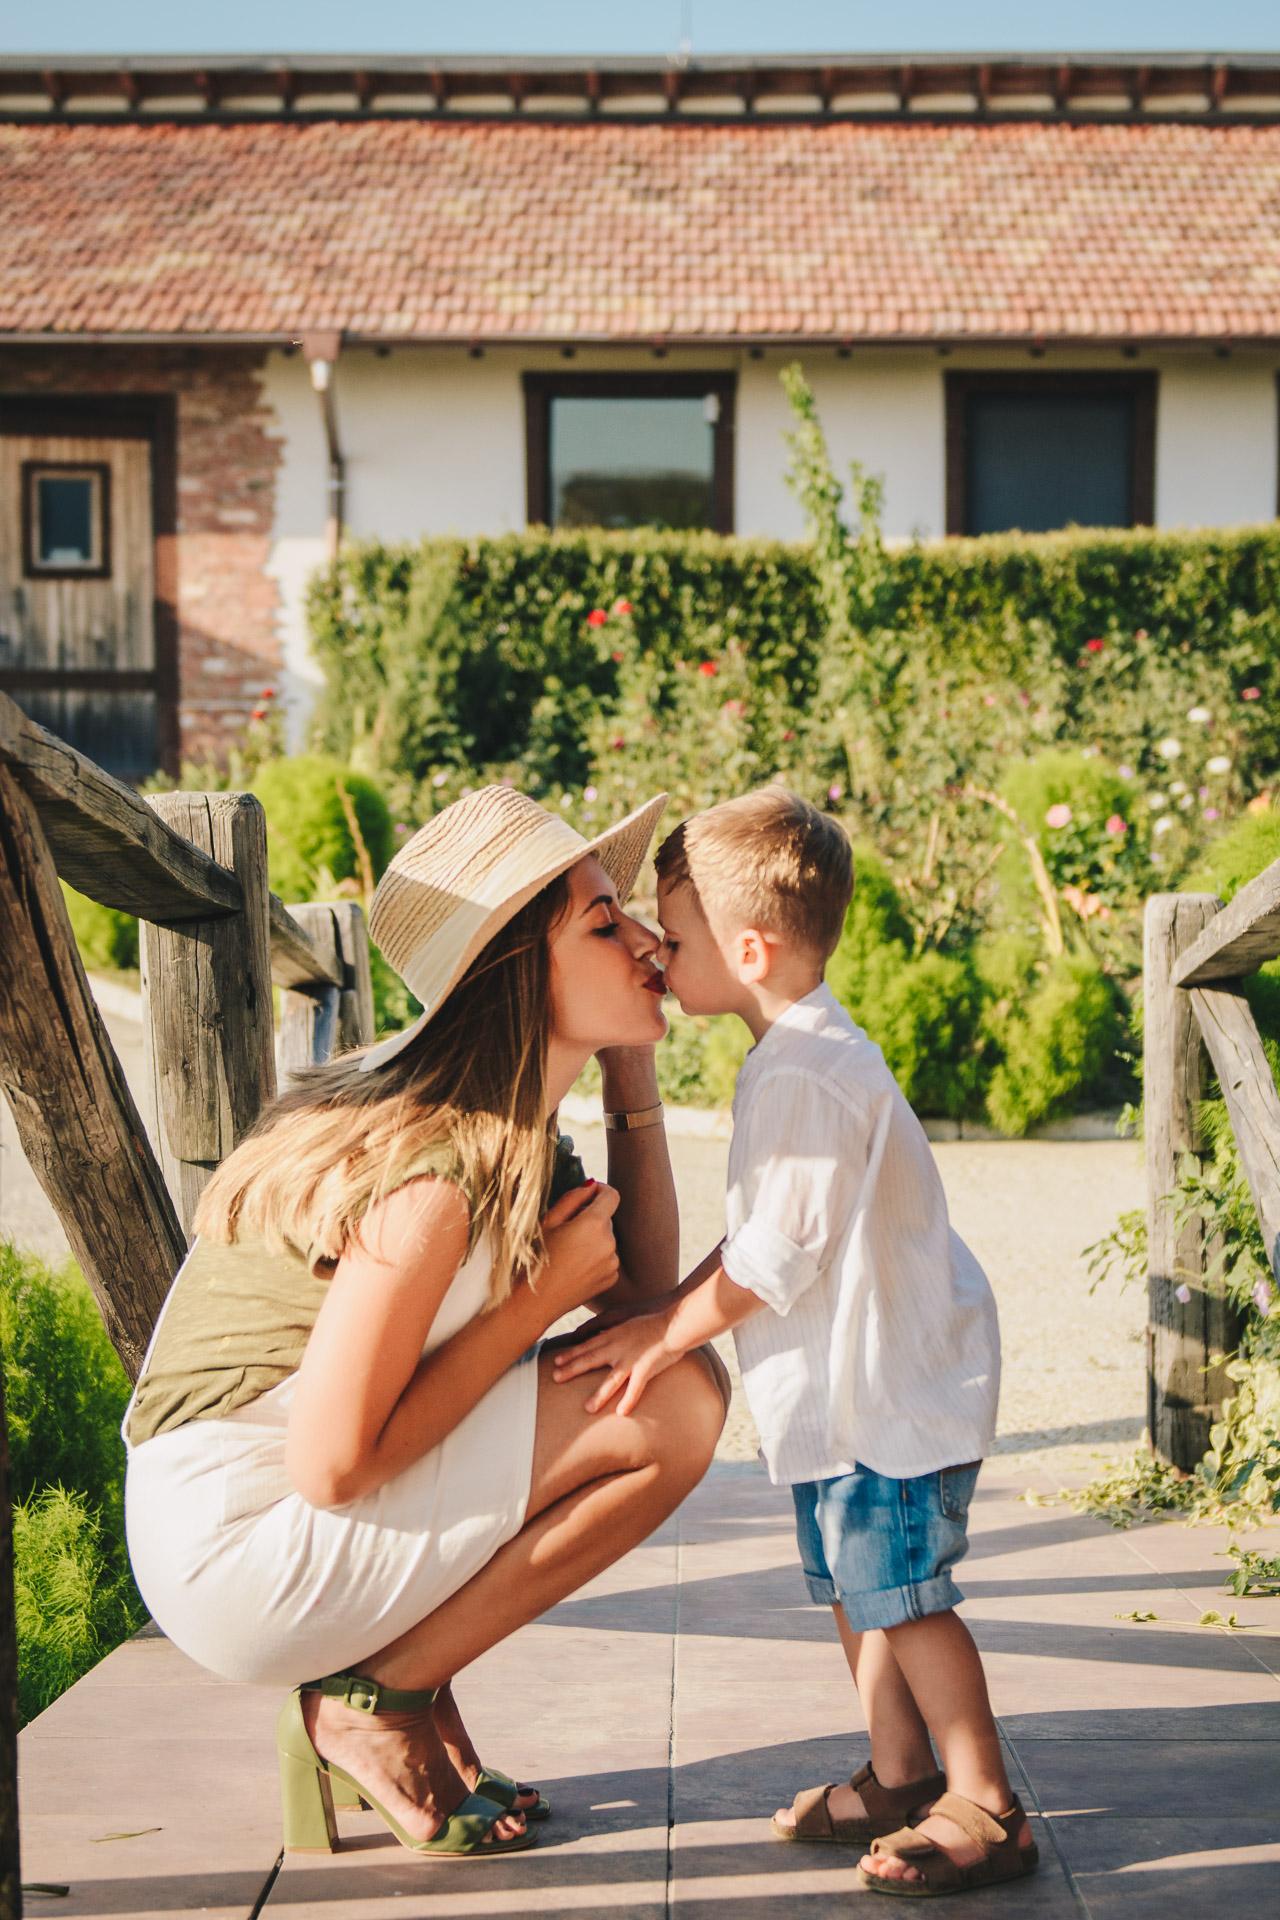 Family holiday at seven generation